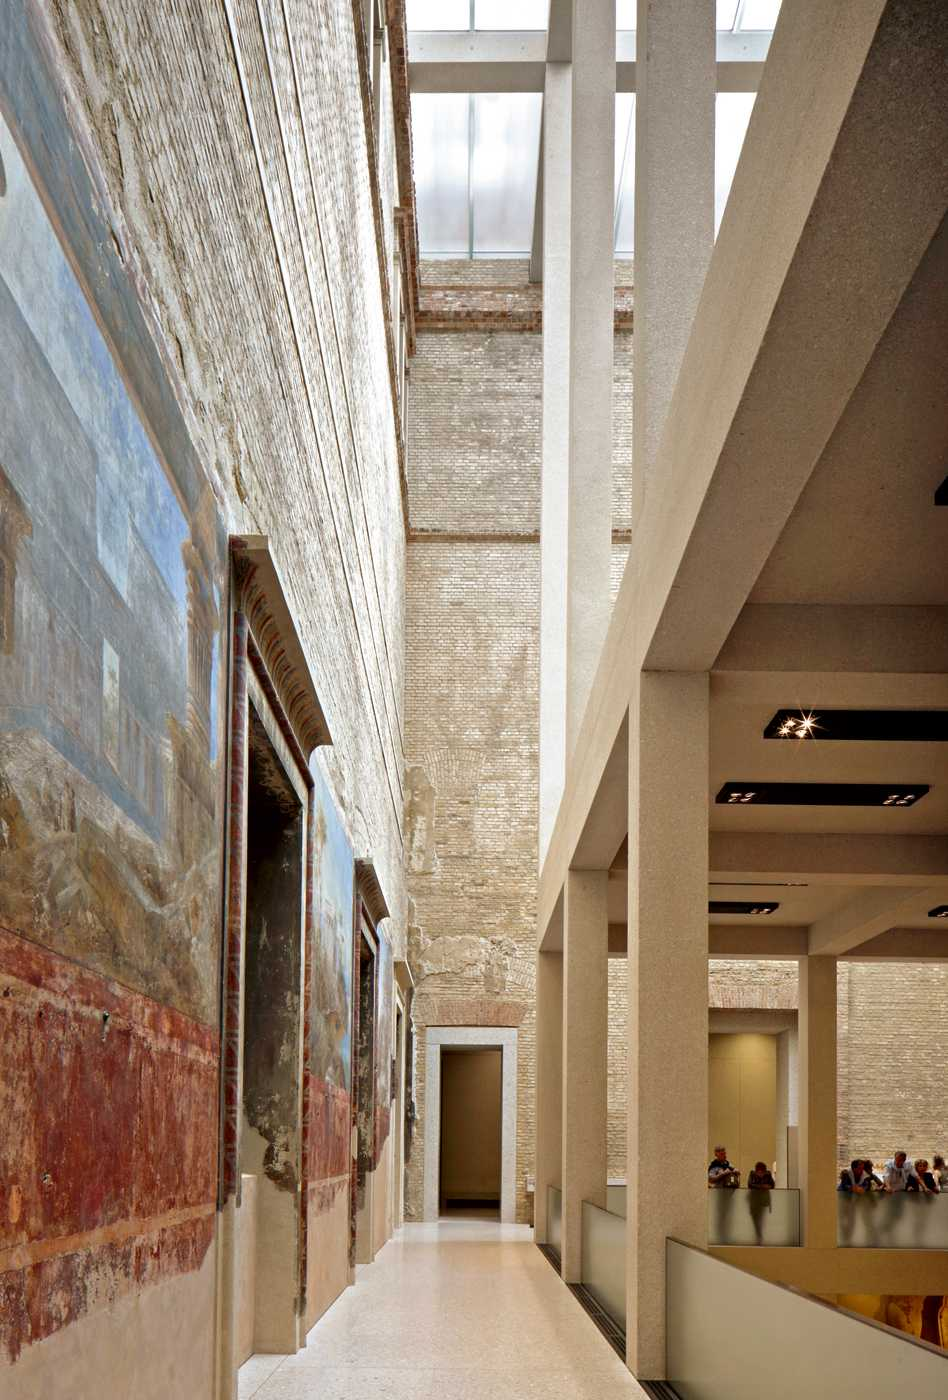 James Simon Galerie  - 17 3.2 37